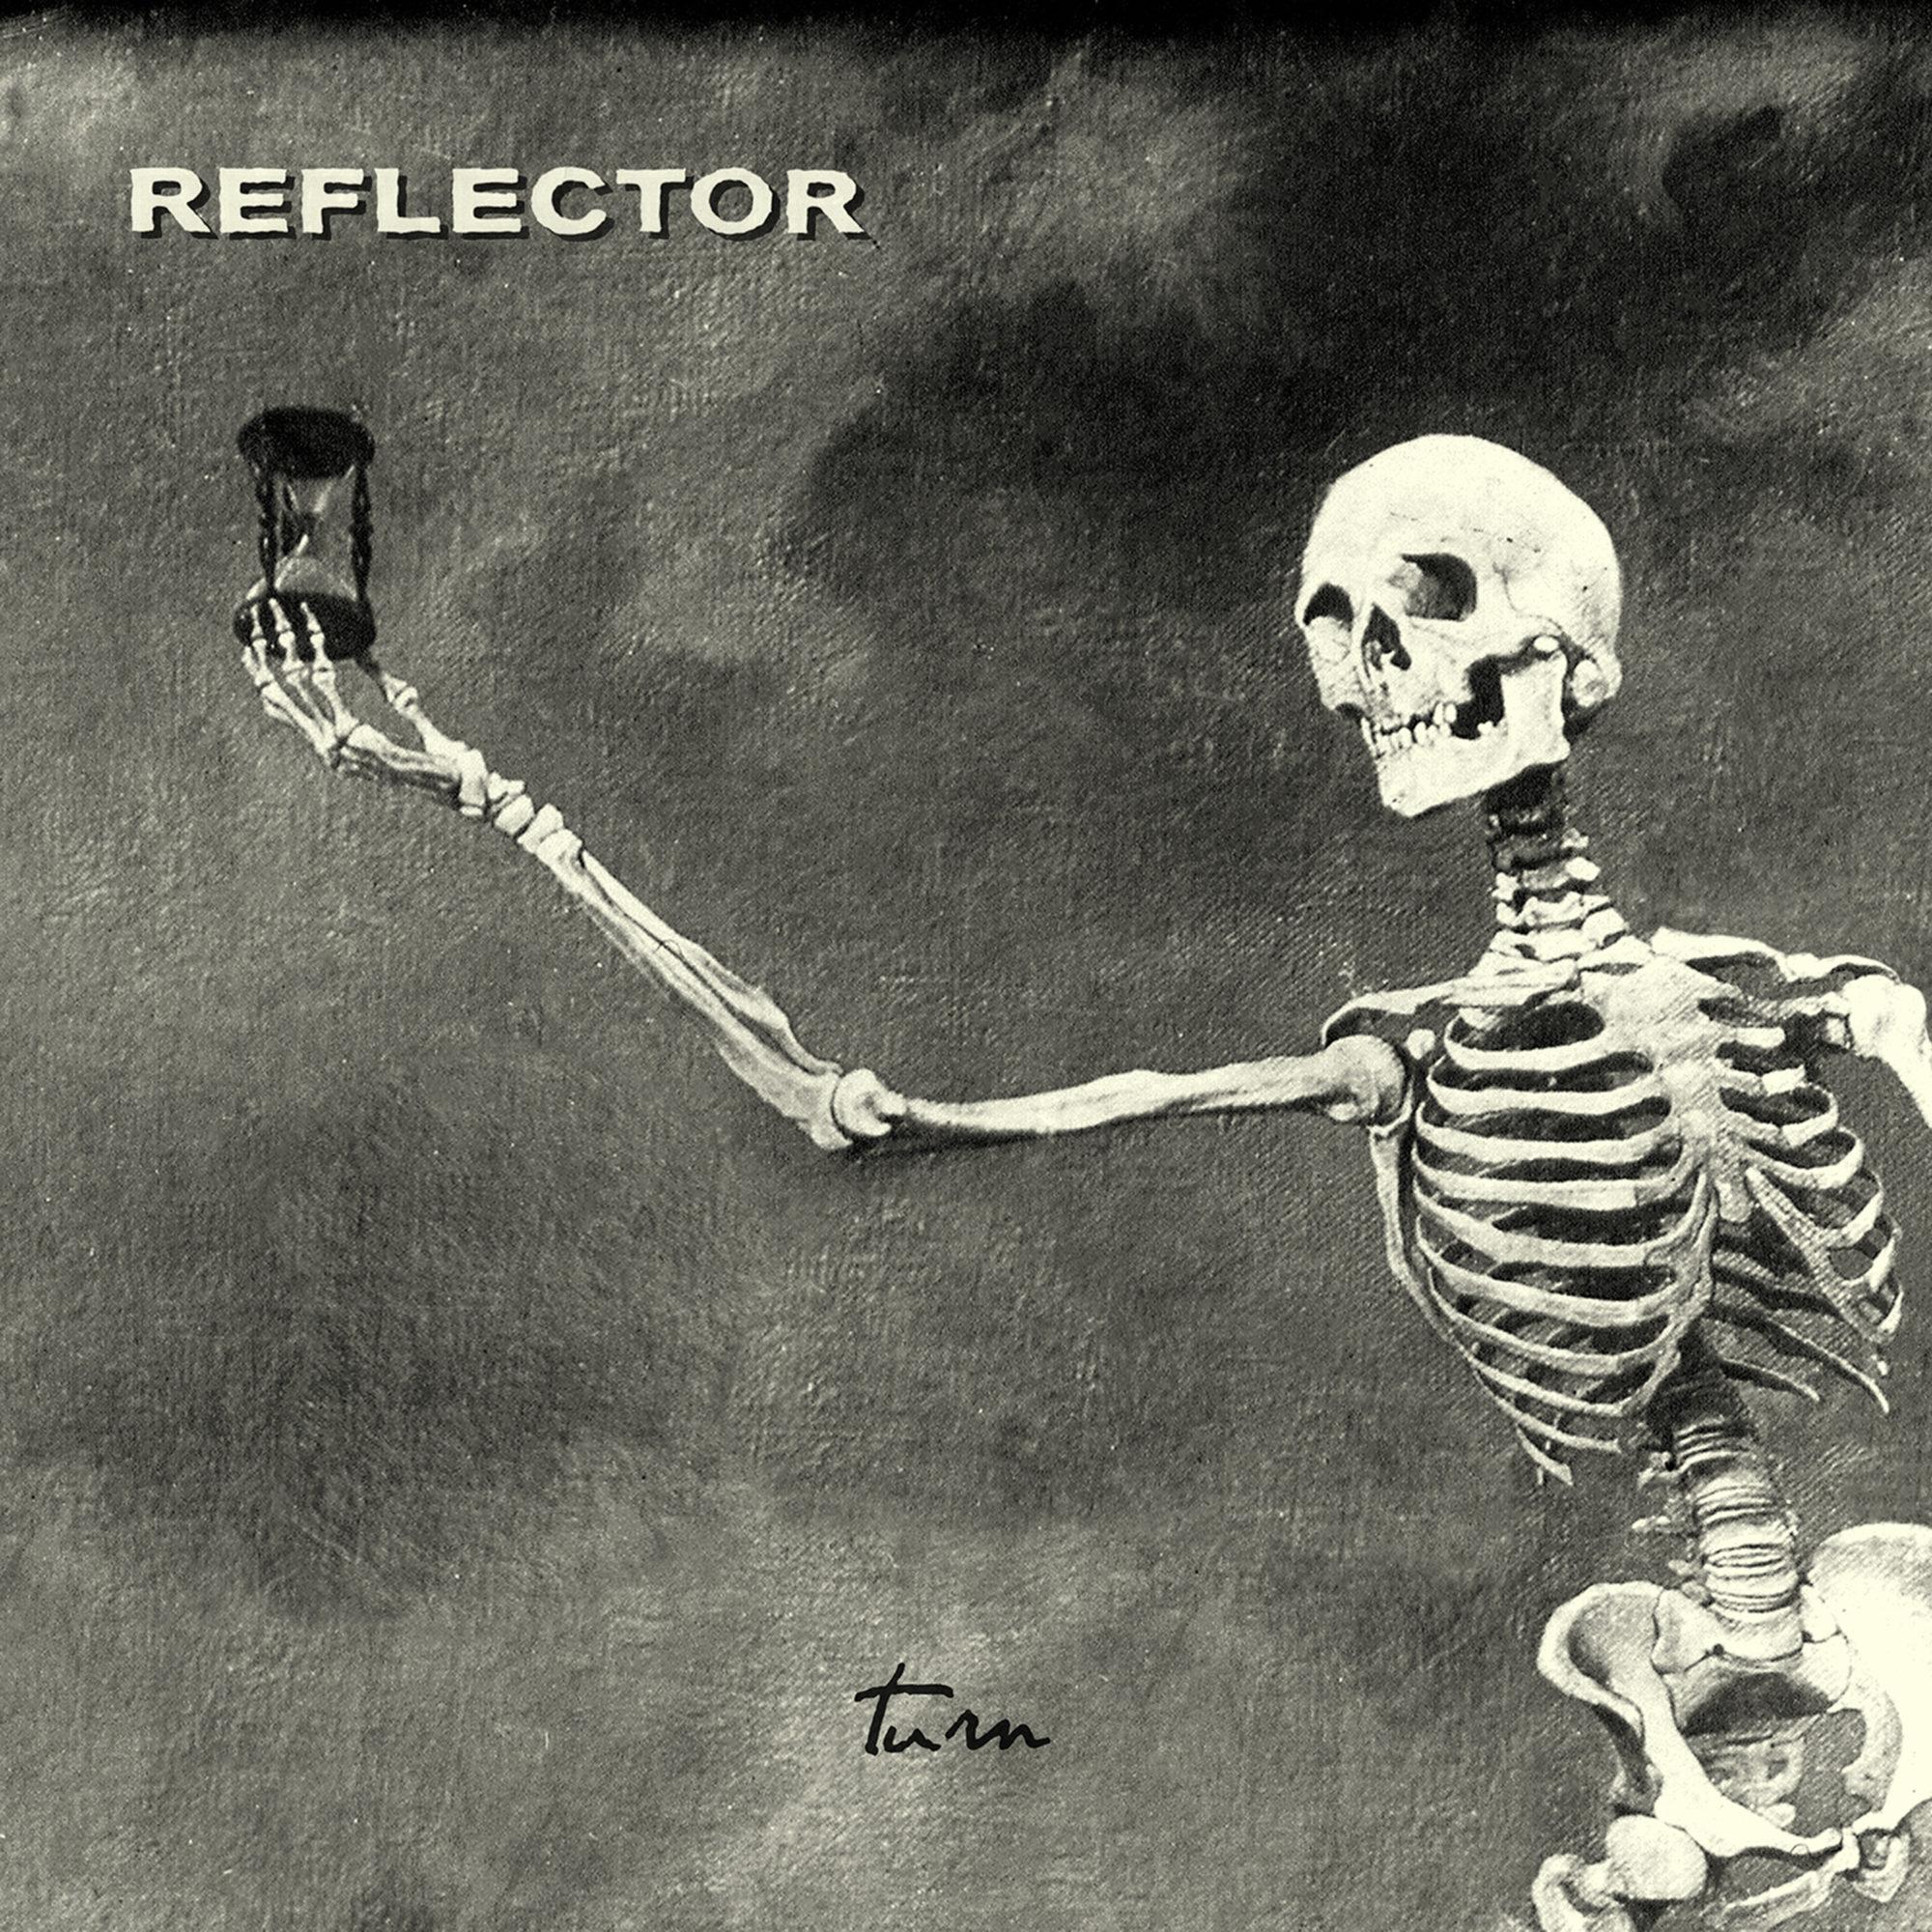 Reflectir Band Music Turn LP Cover